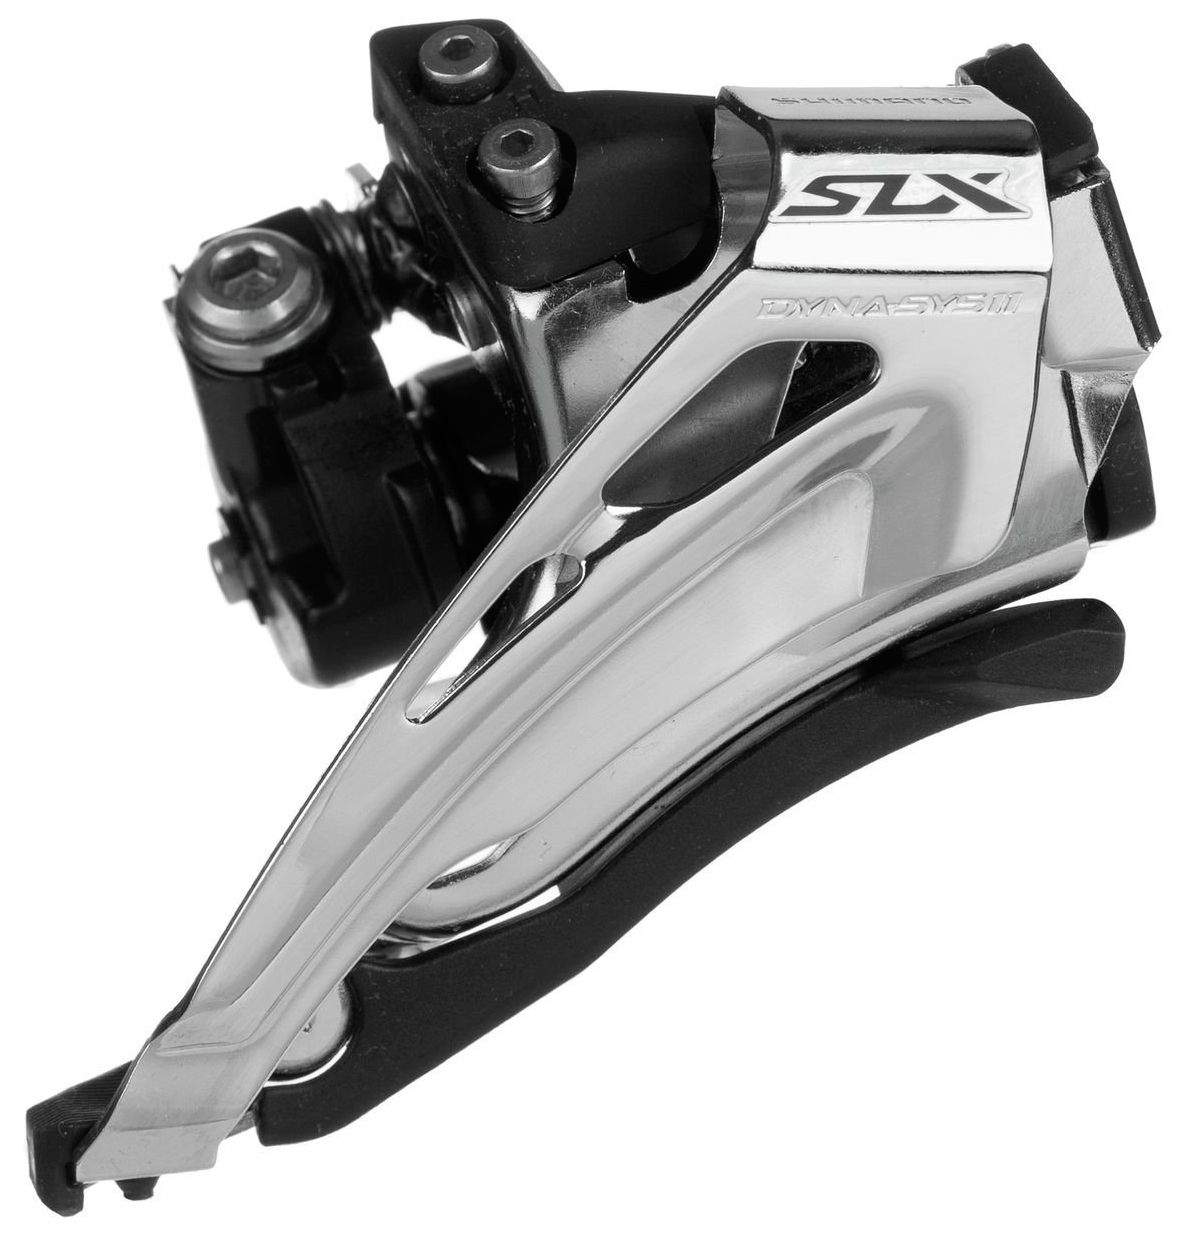 Товар Shimano SLX M7025-L, 2x11,  переключение  - артикул:285239